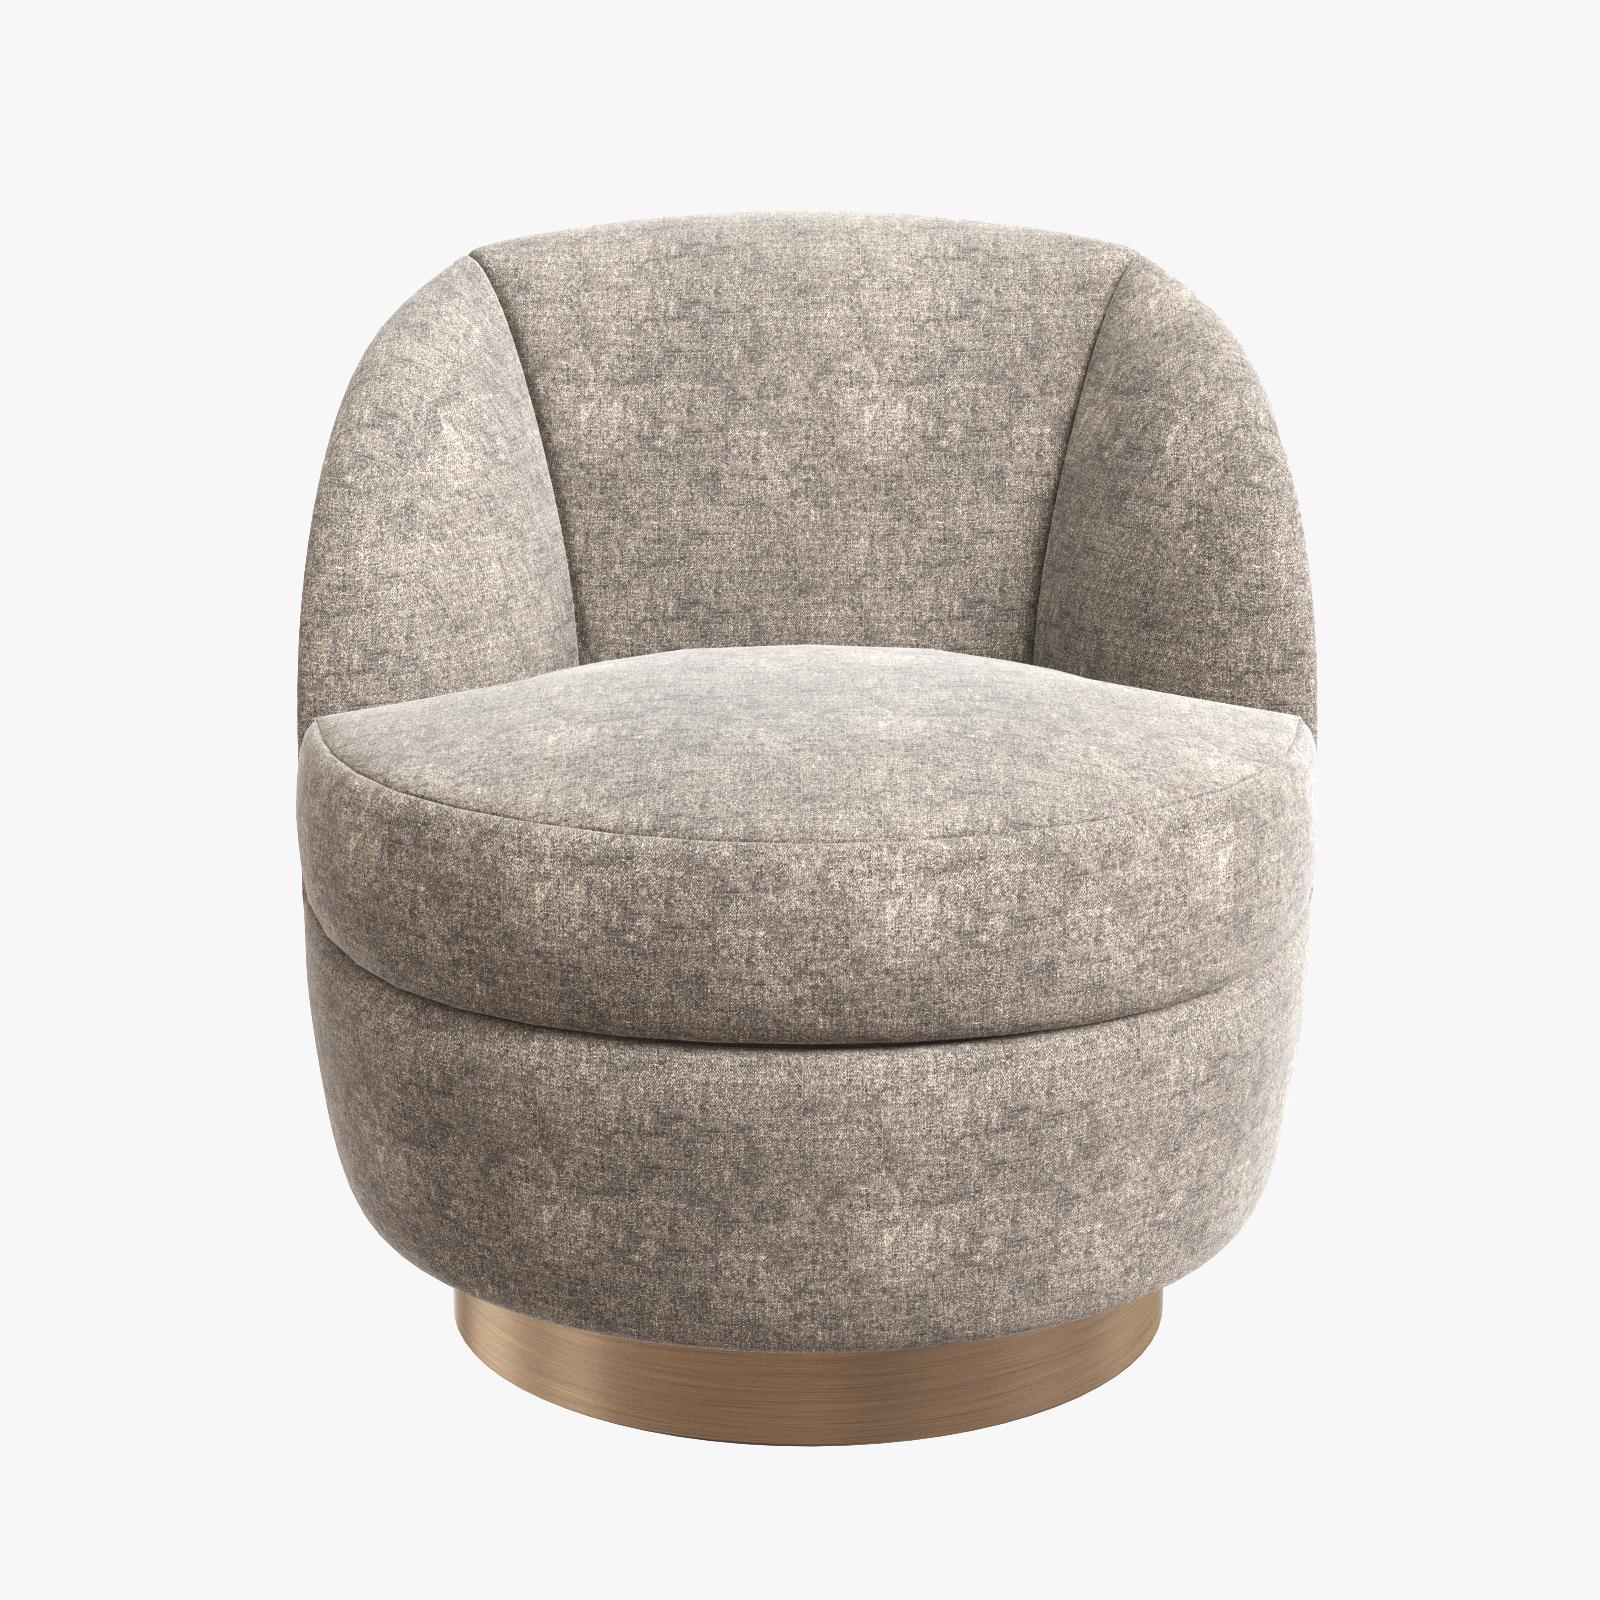 Wondrous Elegant Swivel Tub Chair By Milo Baughman Camellatalisay Diy Chair Ideas Camellatalisaycom